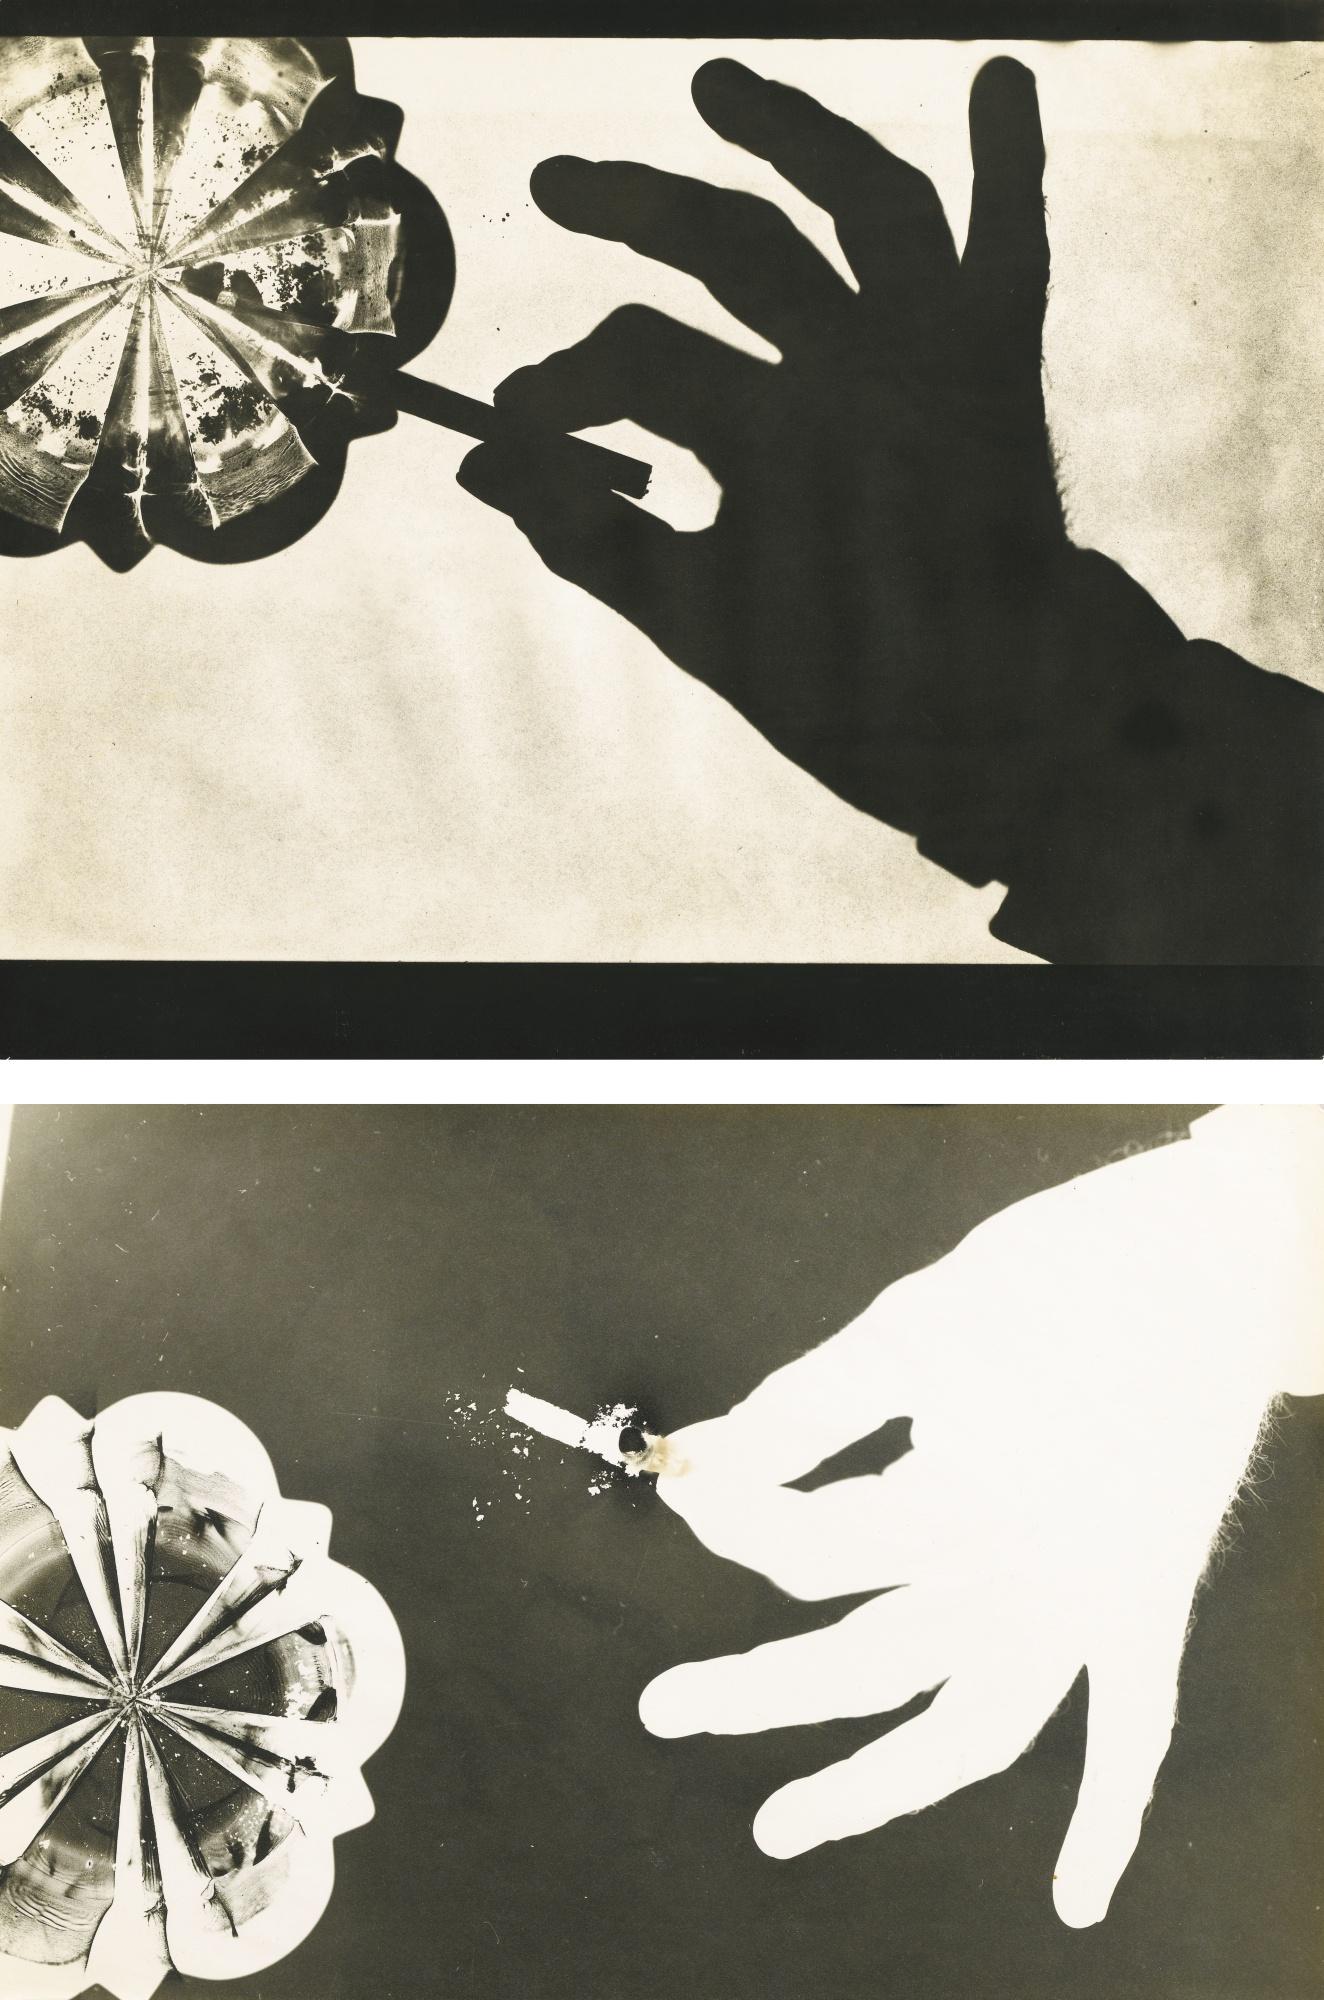 Geza Vandor-Hand With Cigarette (Diptych) Paris-1930